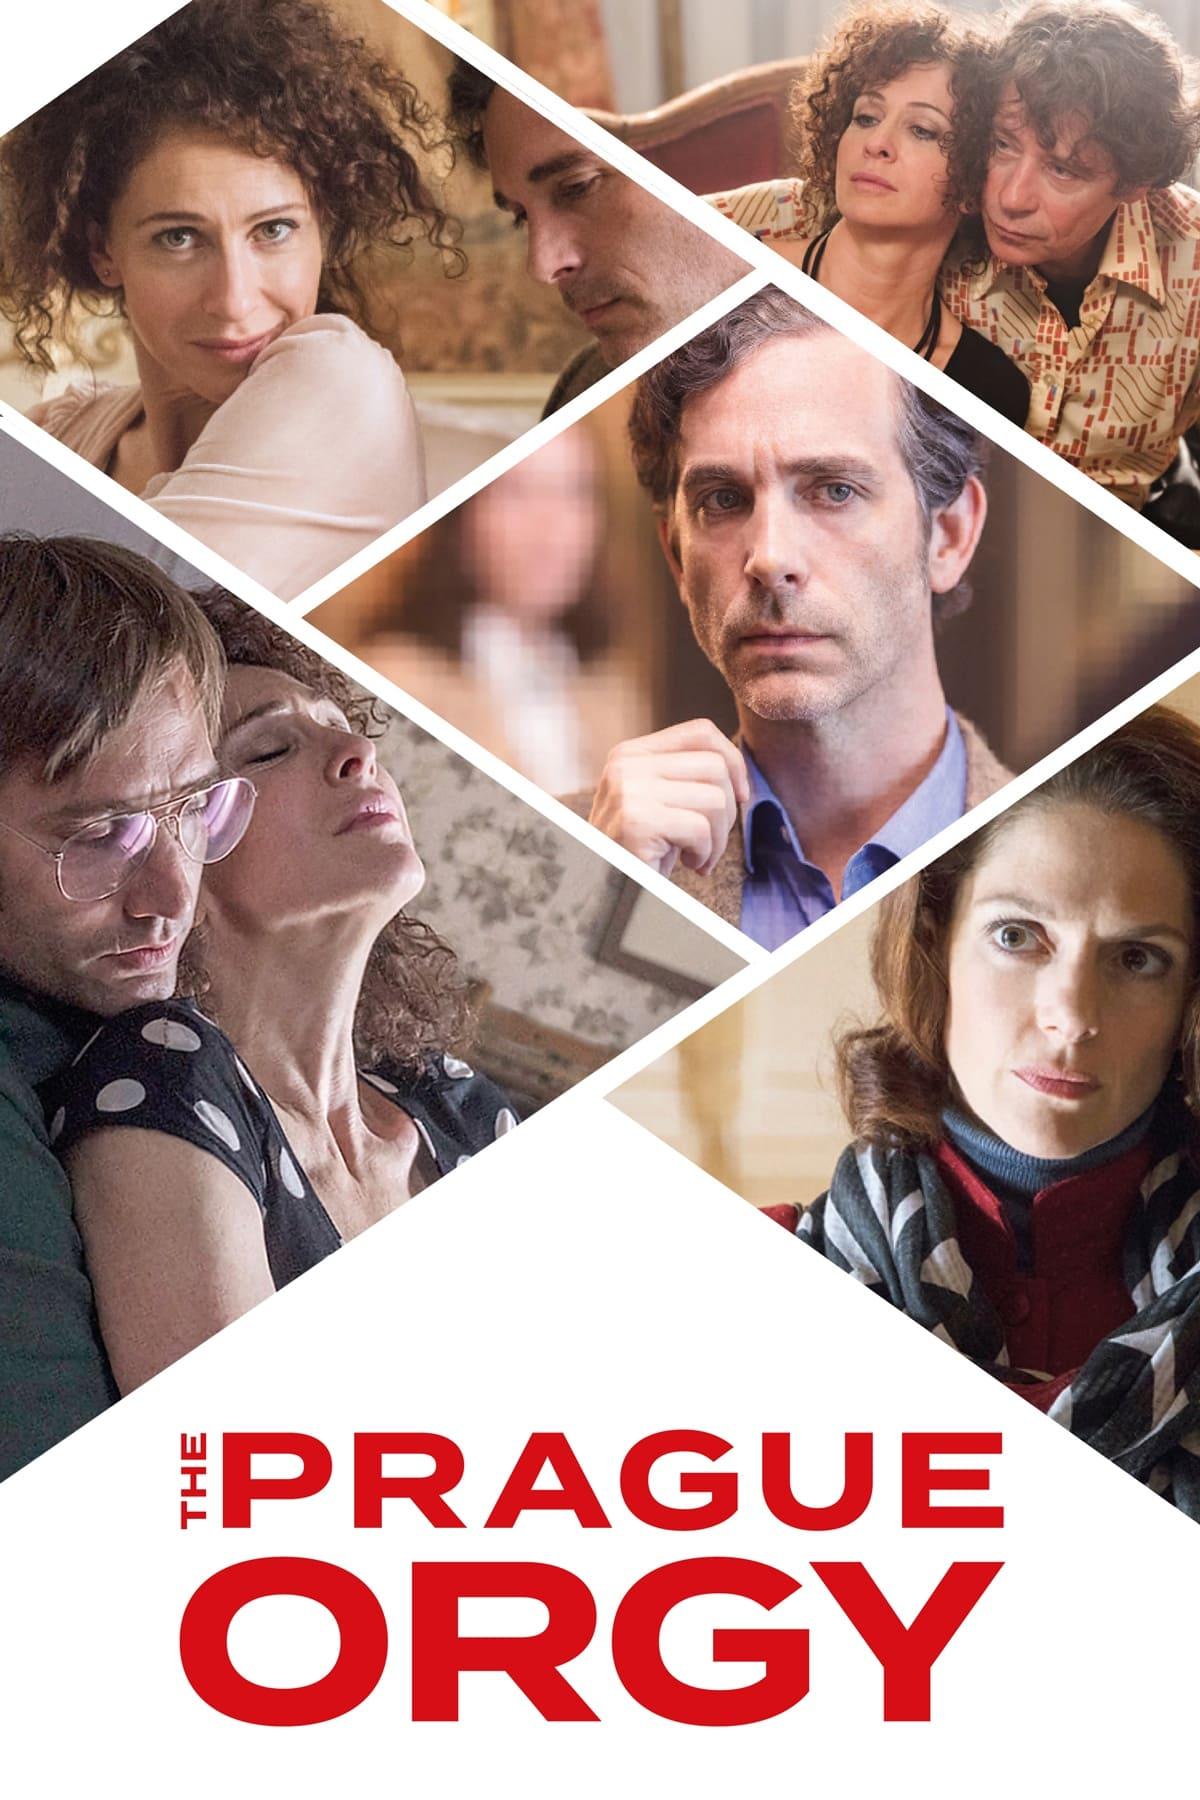 The Prague Orgy